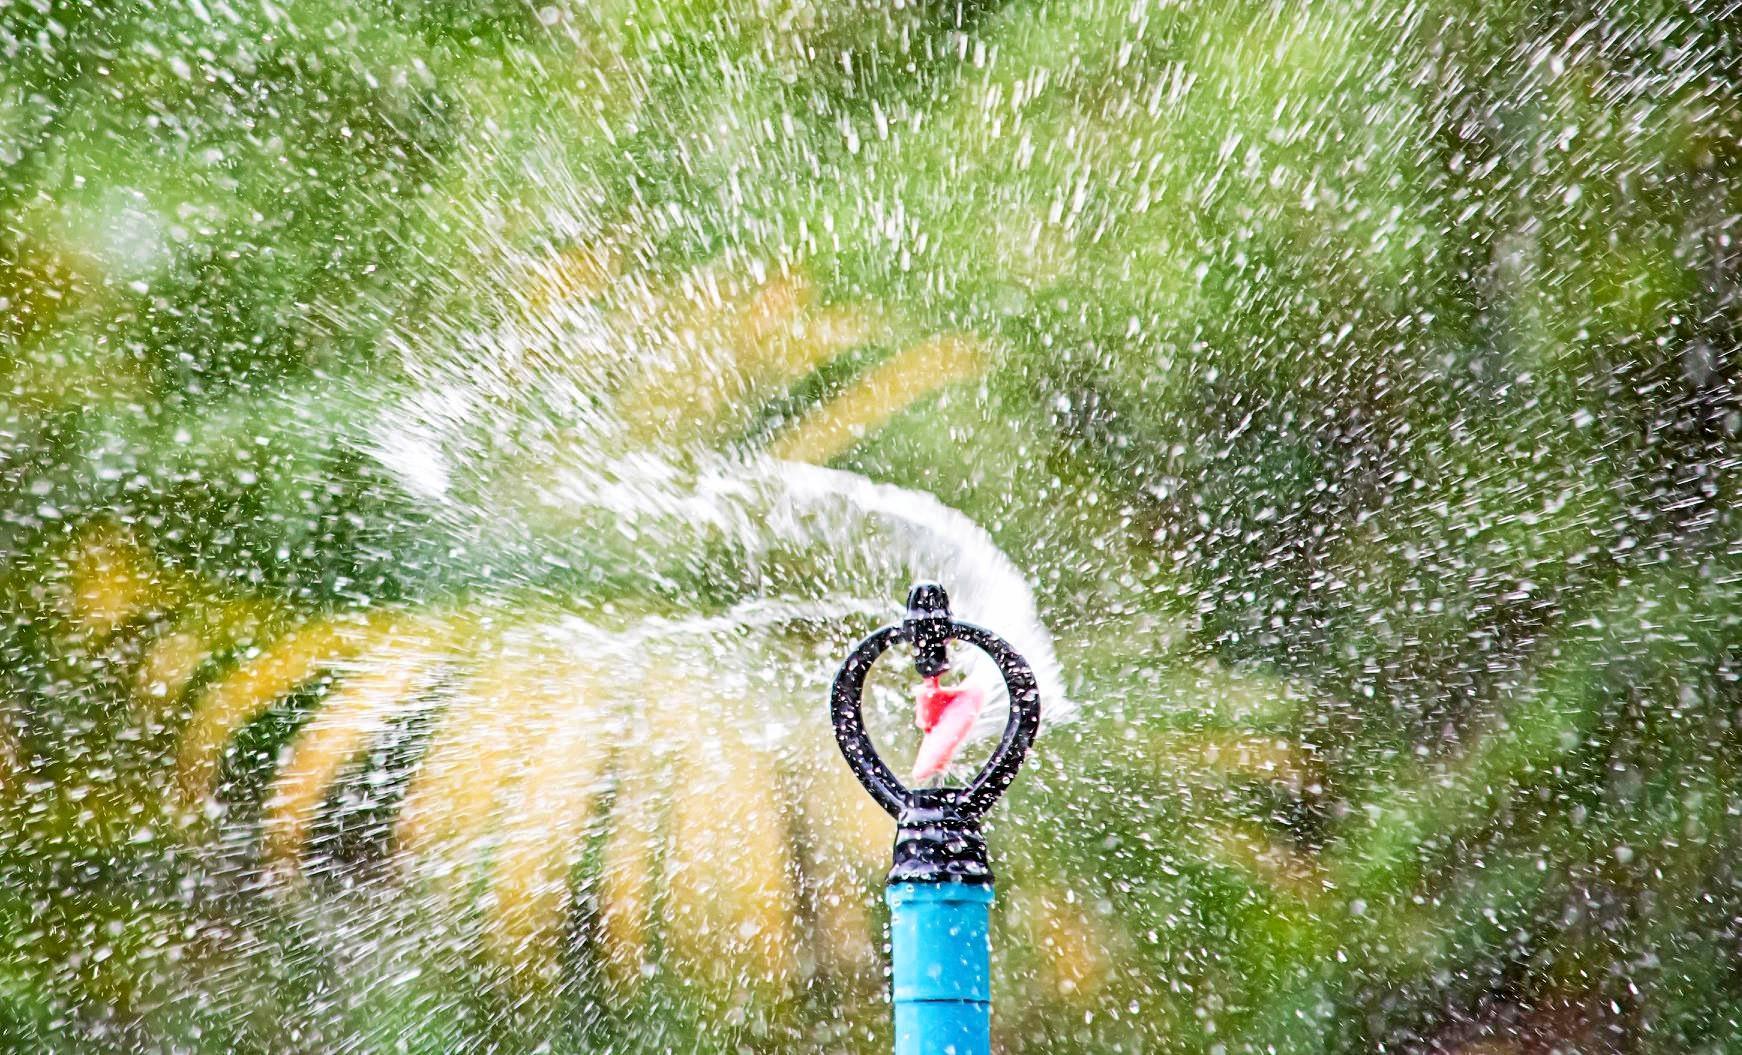 Taroom Water Restrictions